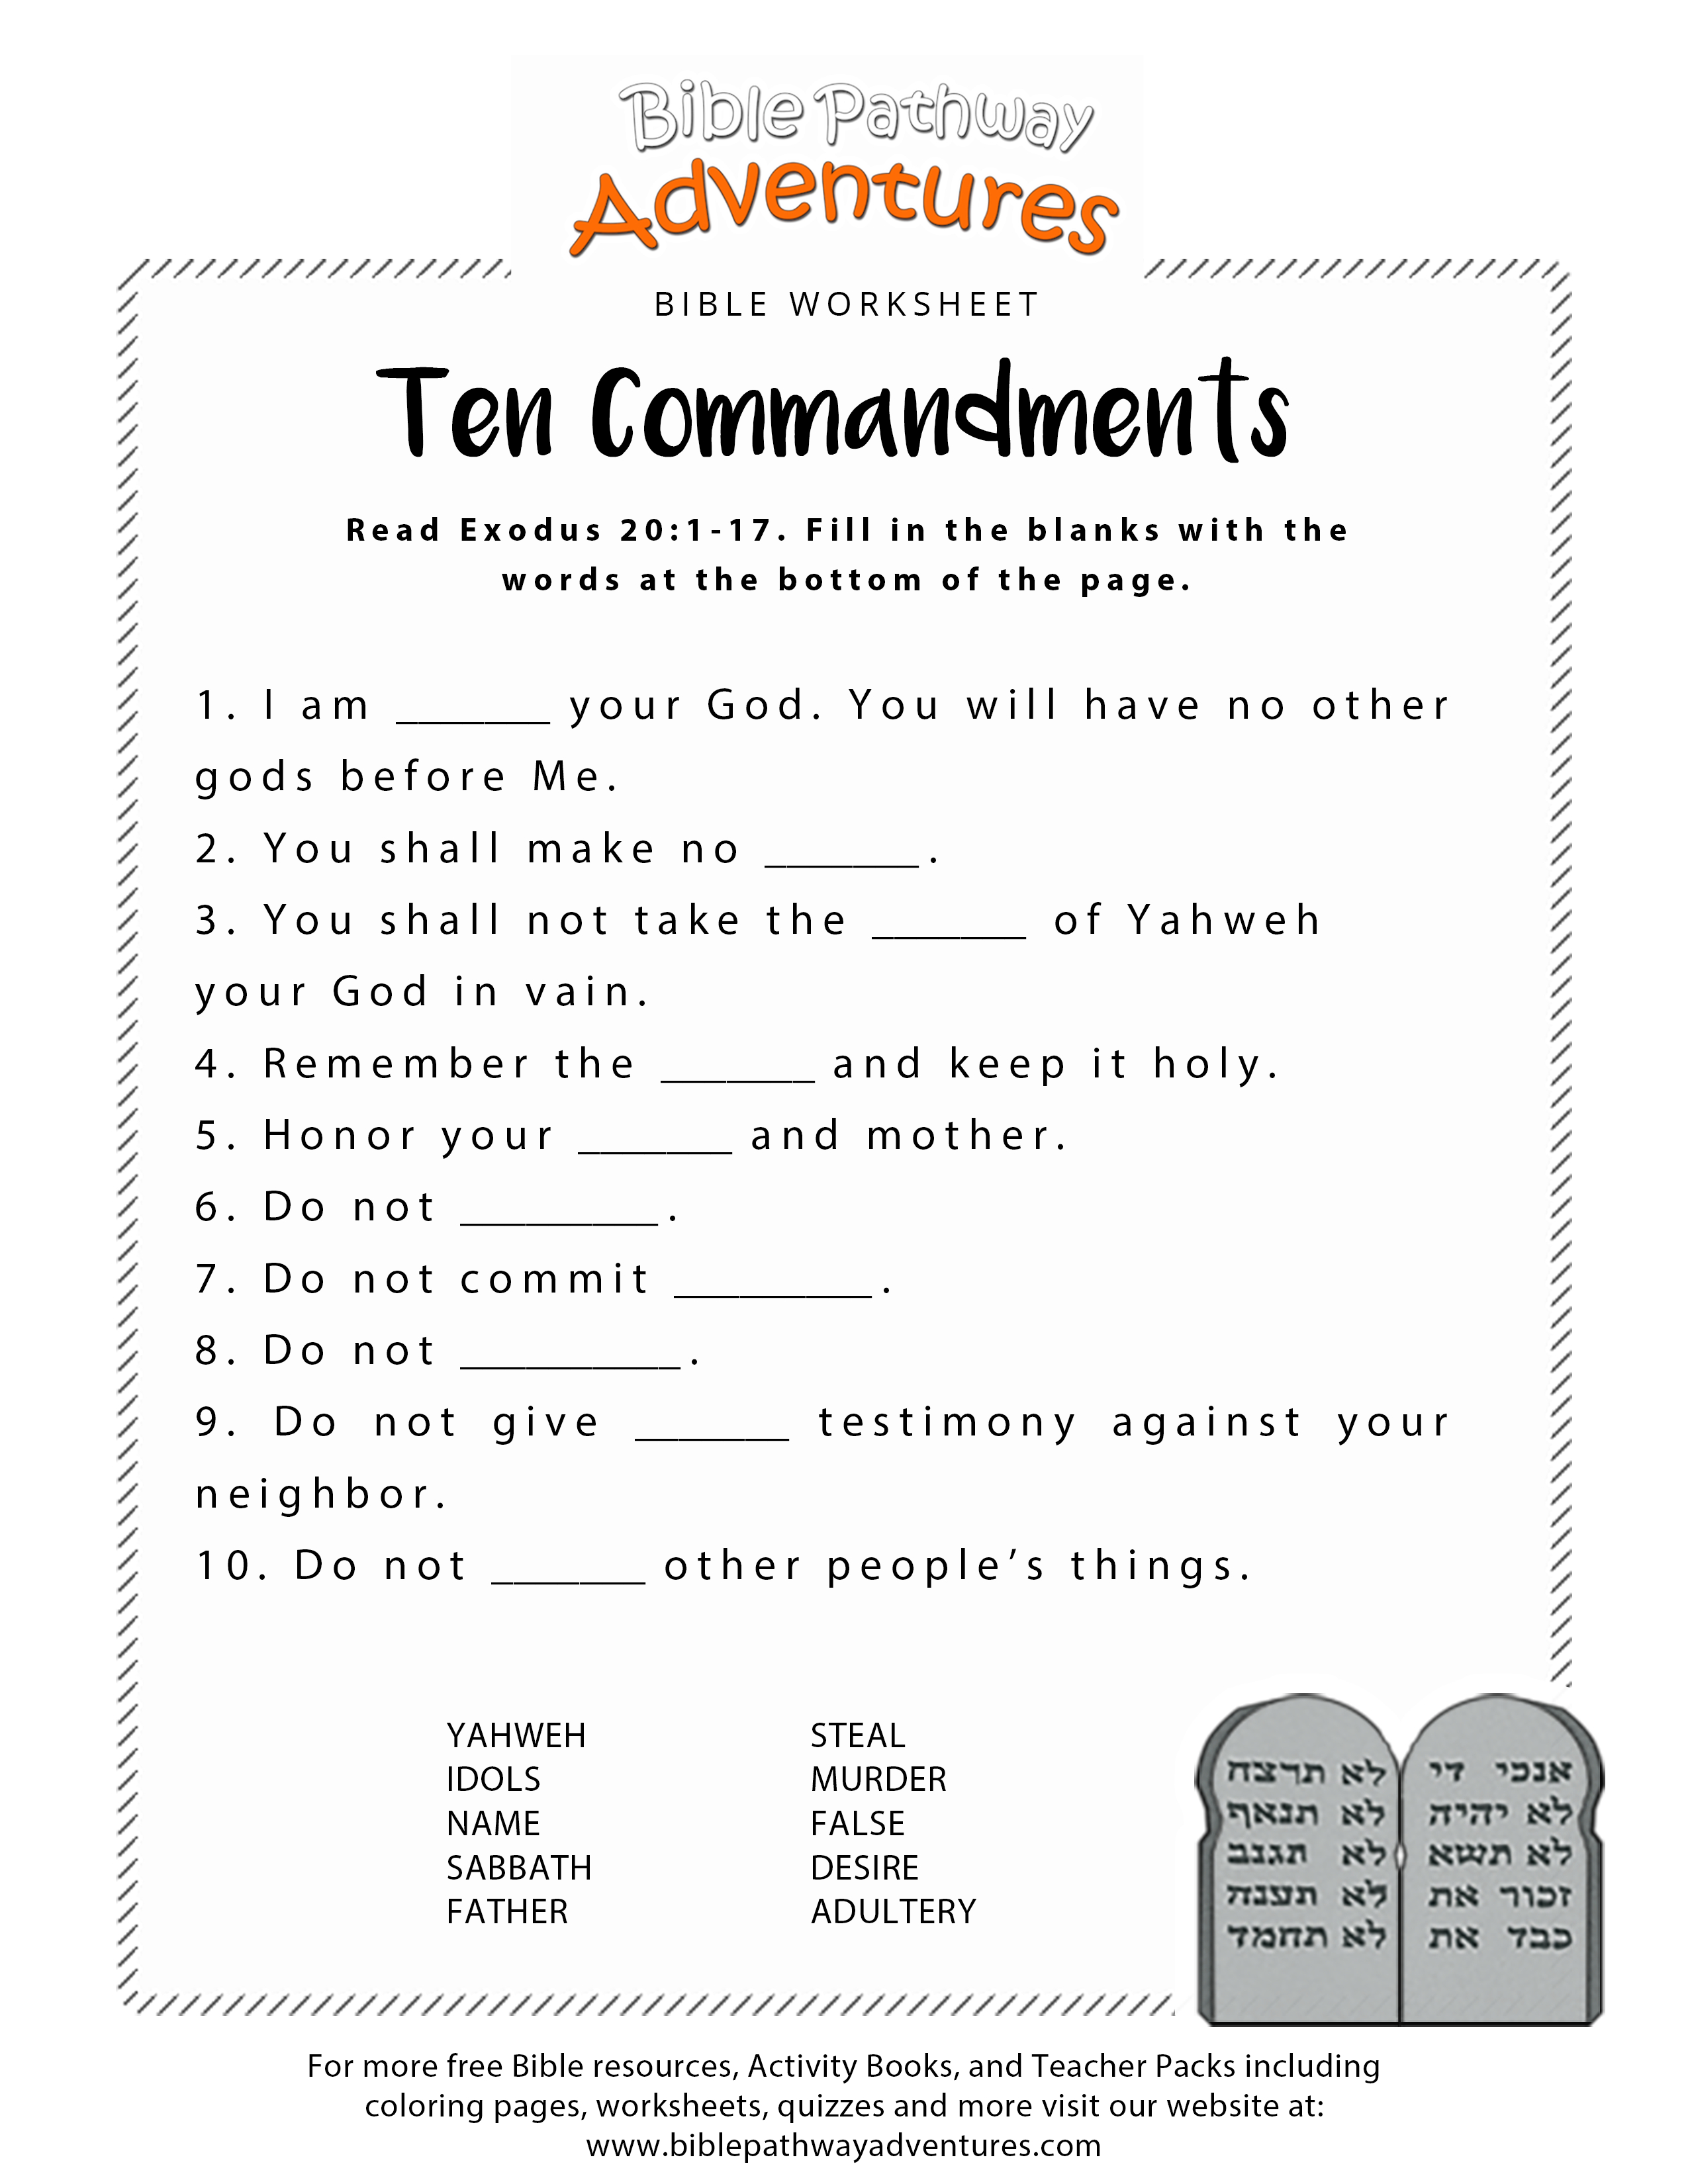 Ten Commandments Worksheet For Kids | Junior Church | Bible Lessons | Free Printable Children's Bible Lessons Worksheets